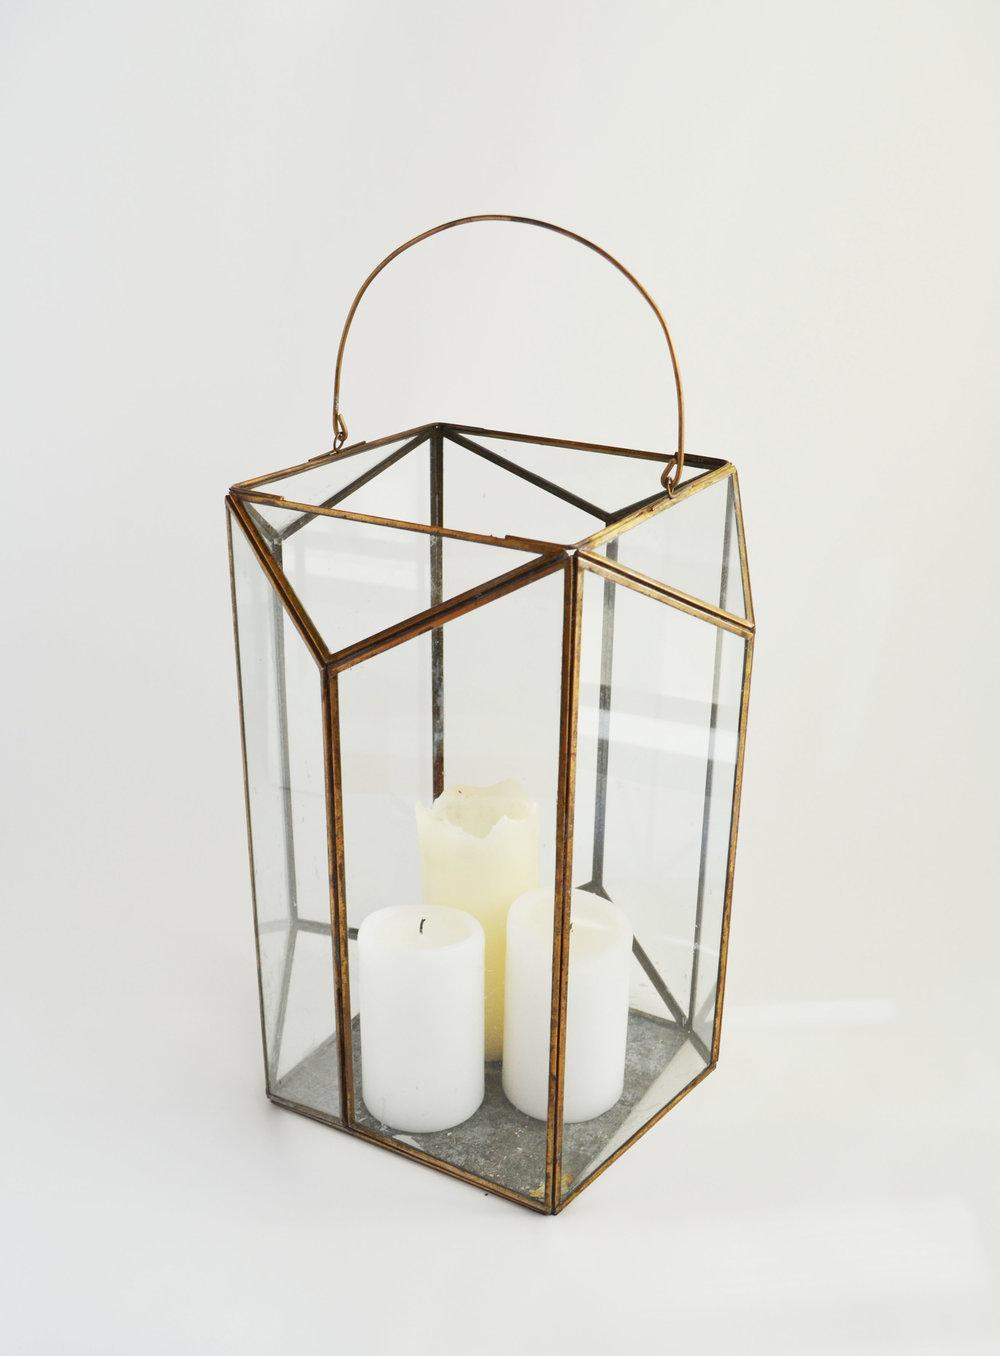 Renee - Large glass lantern   Quantity: 3  Price: $35.00